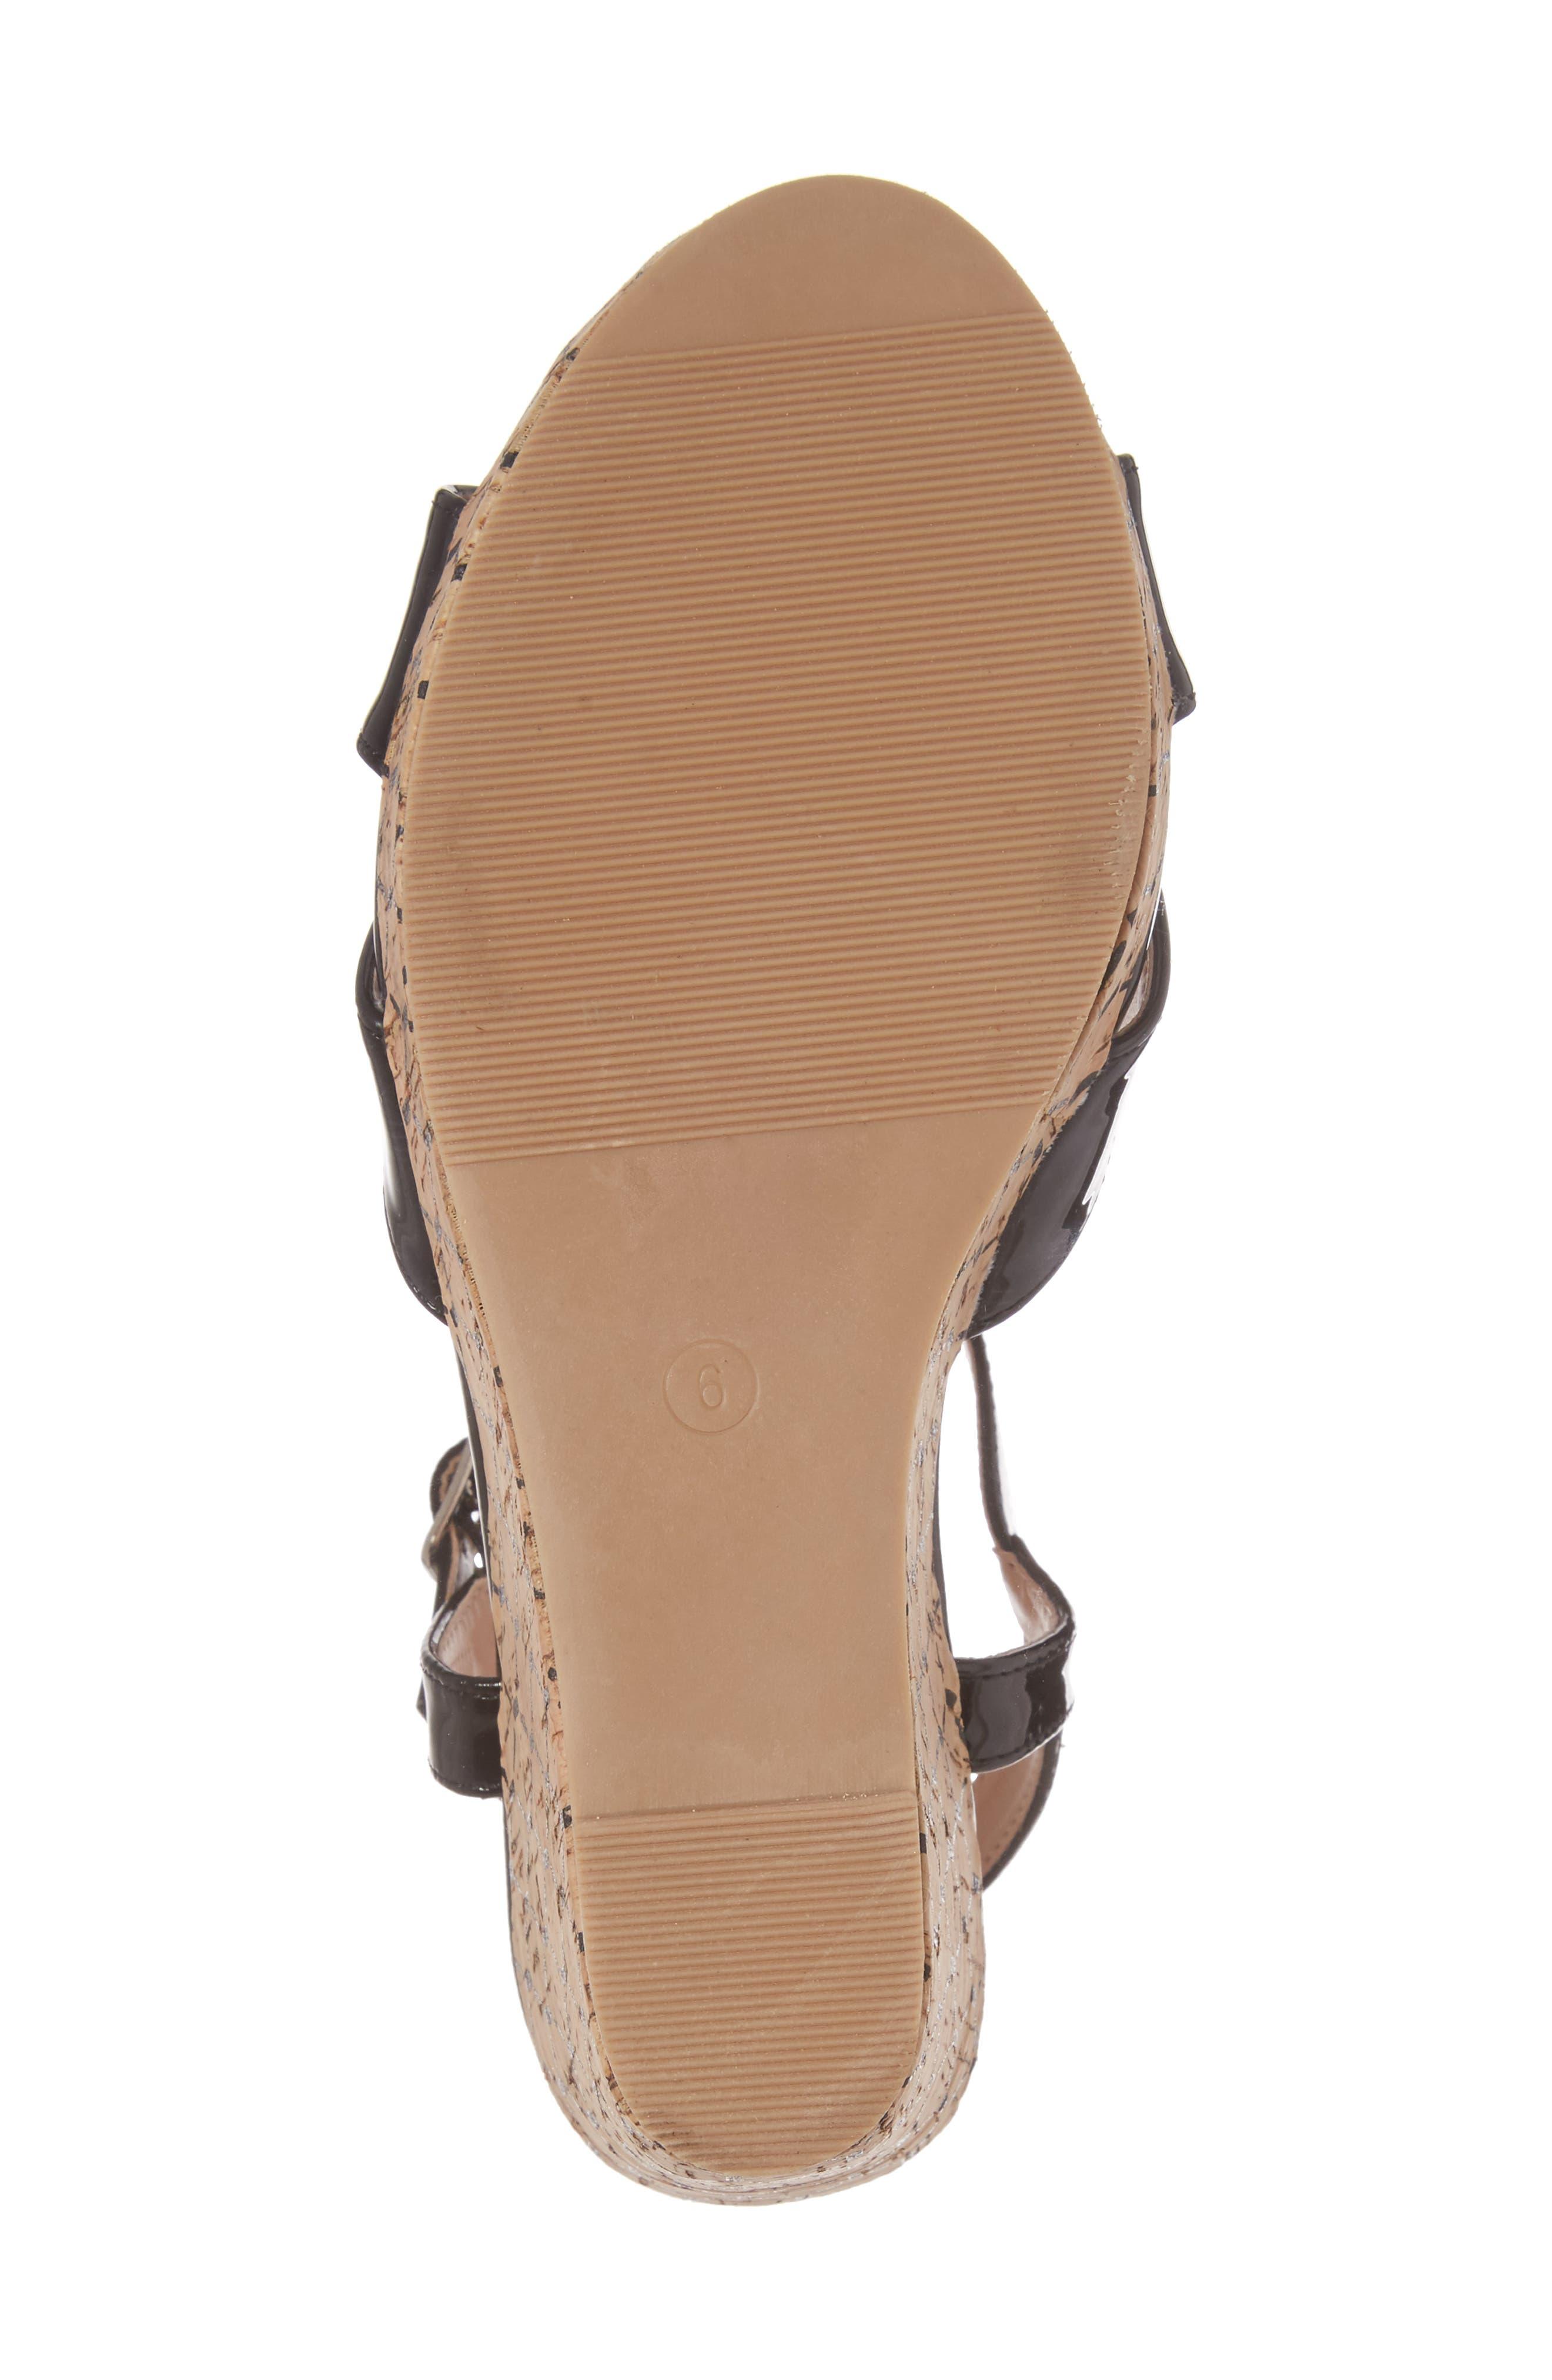 Teluride Platform Wedge Sandal,                             Alternate thumbnail 6, color,                             BLACK SYNTHETIC PATENT